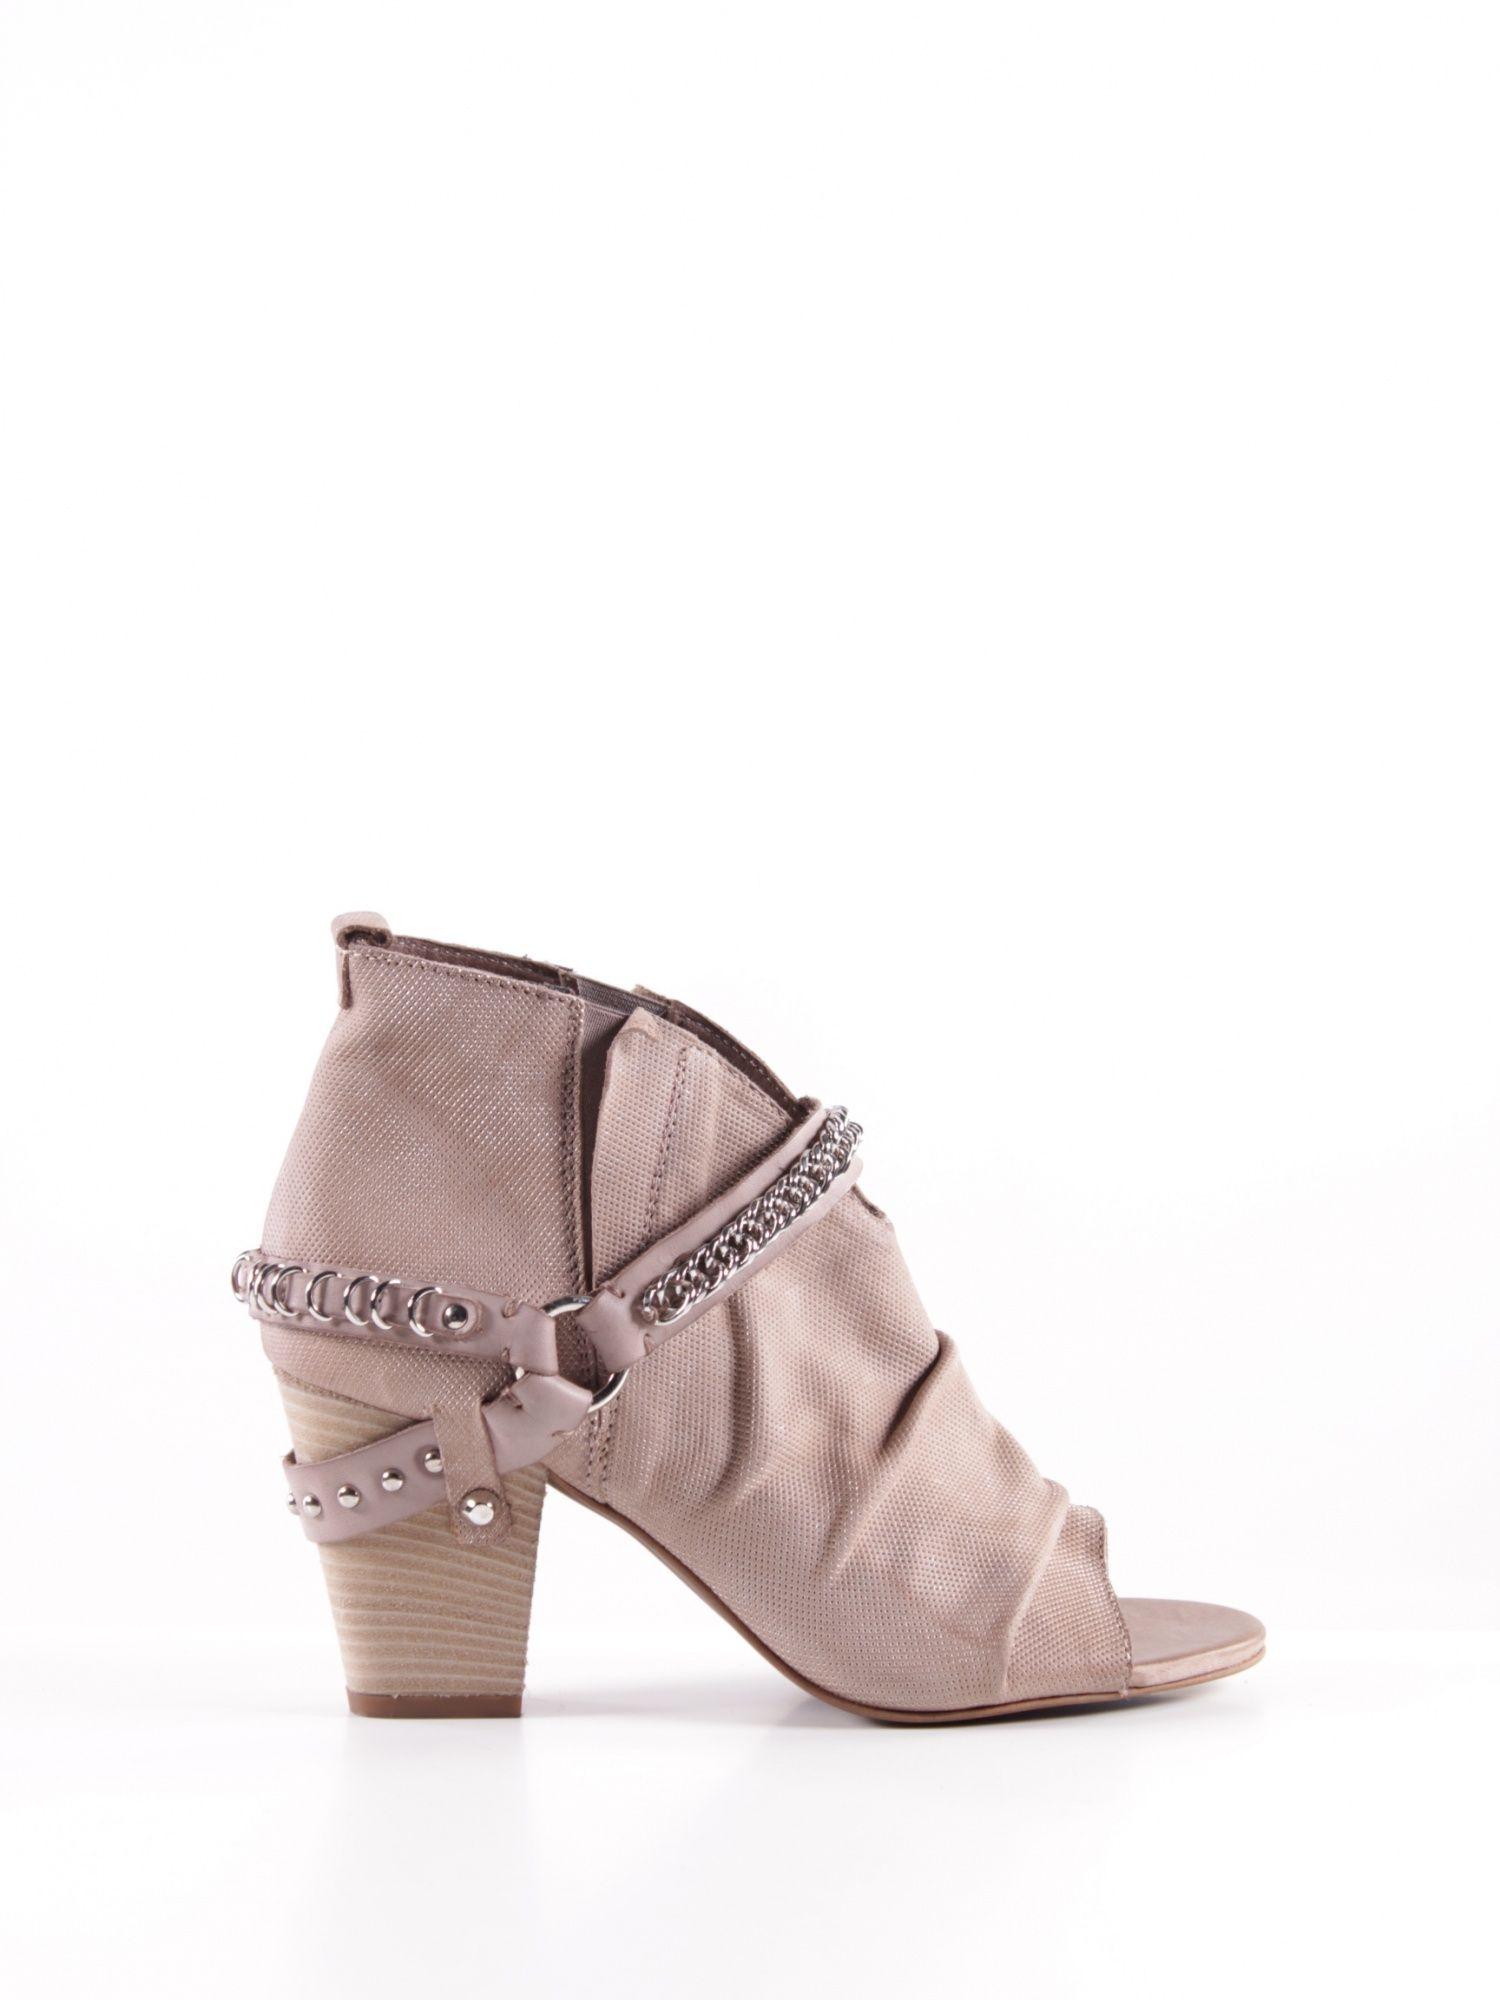 Shop online: www.profonlinestore.com  Brand: Prof Price: 169€ #profstore #profshoespt #fashionshoes #profshoes